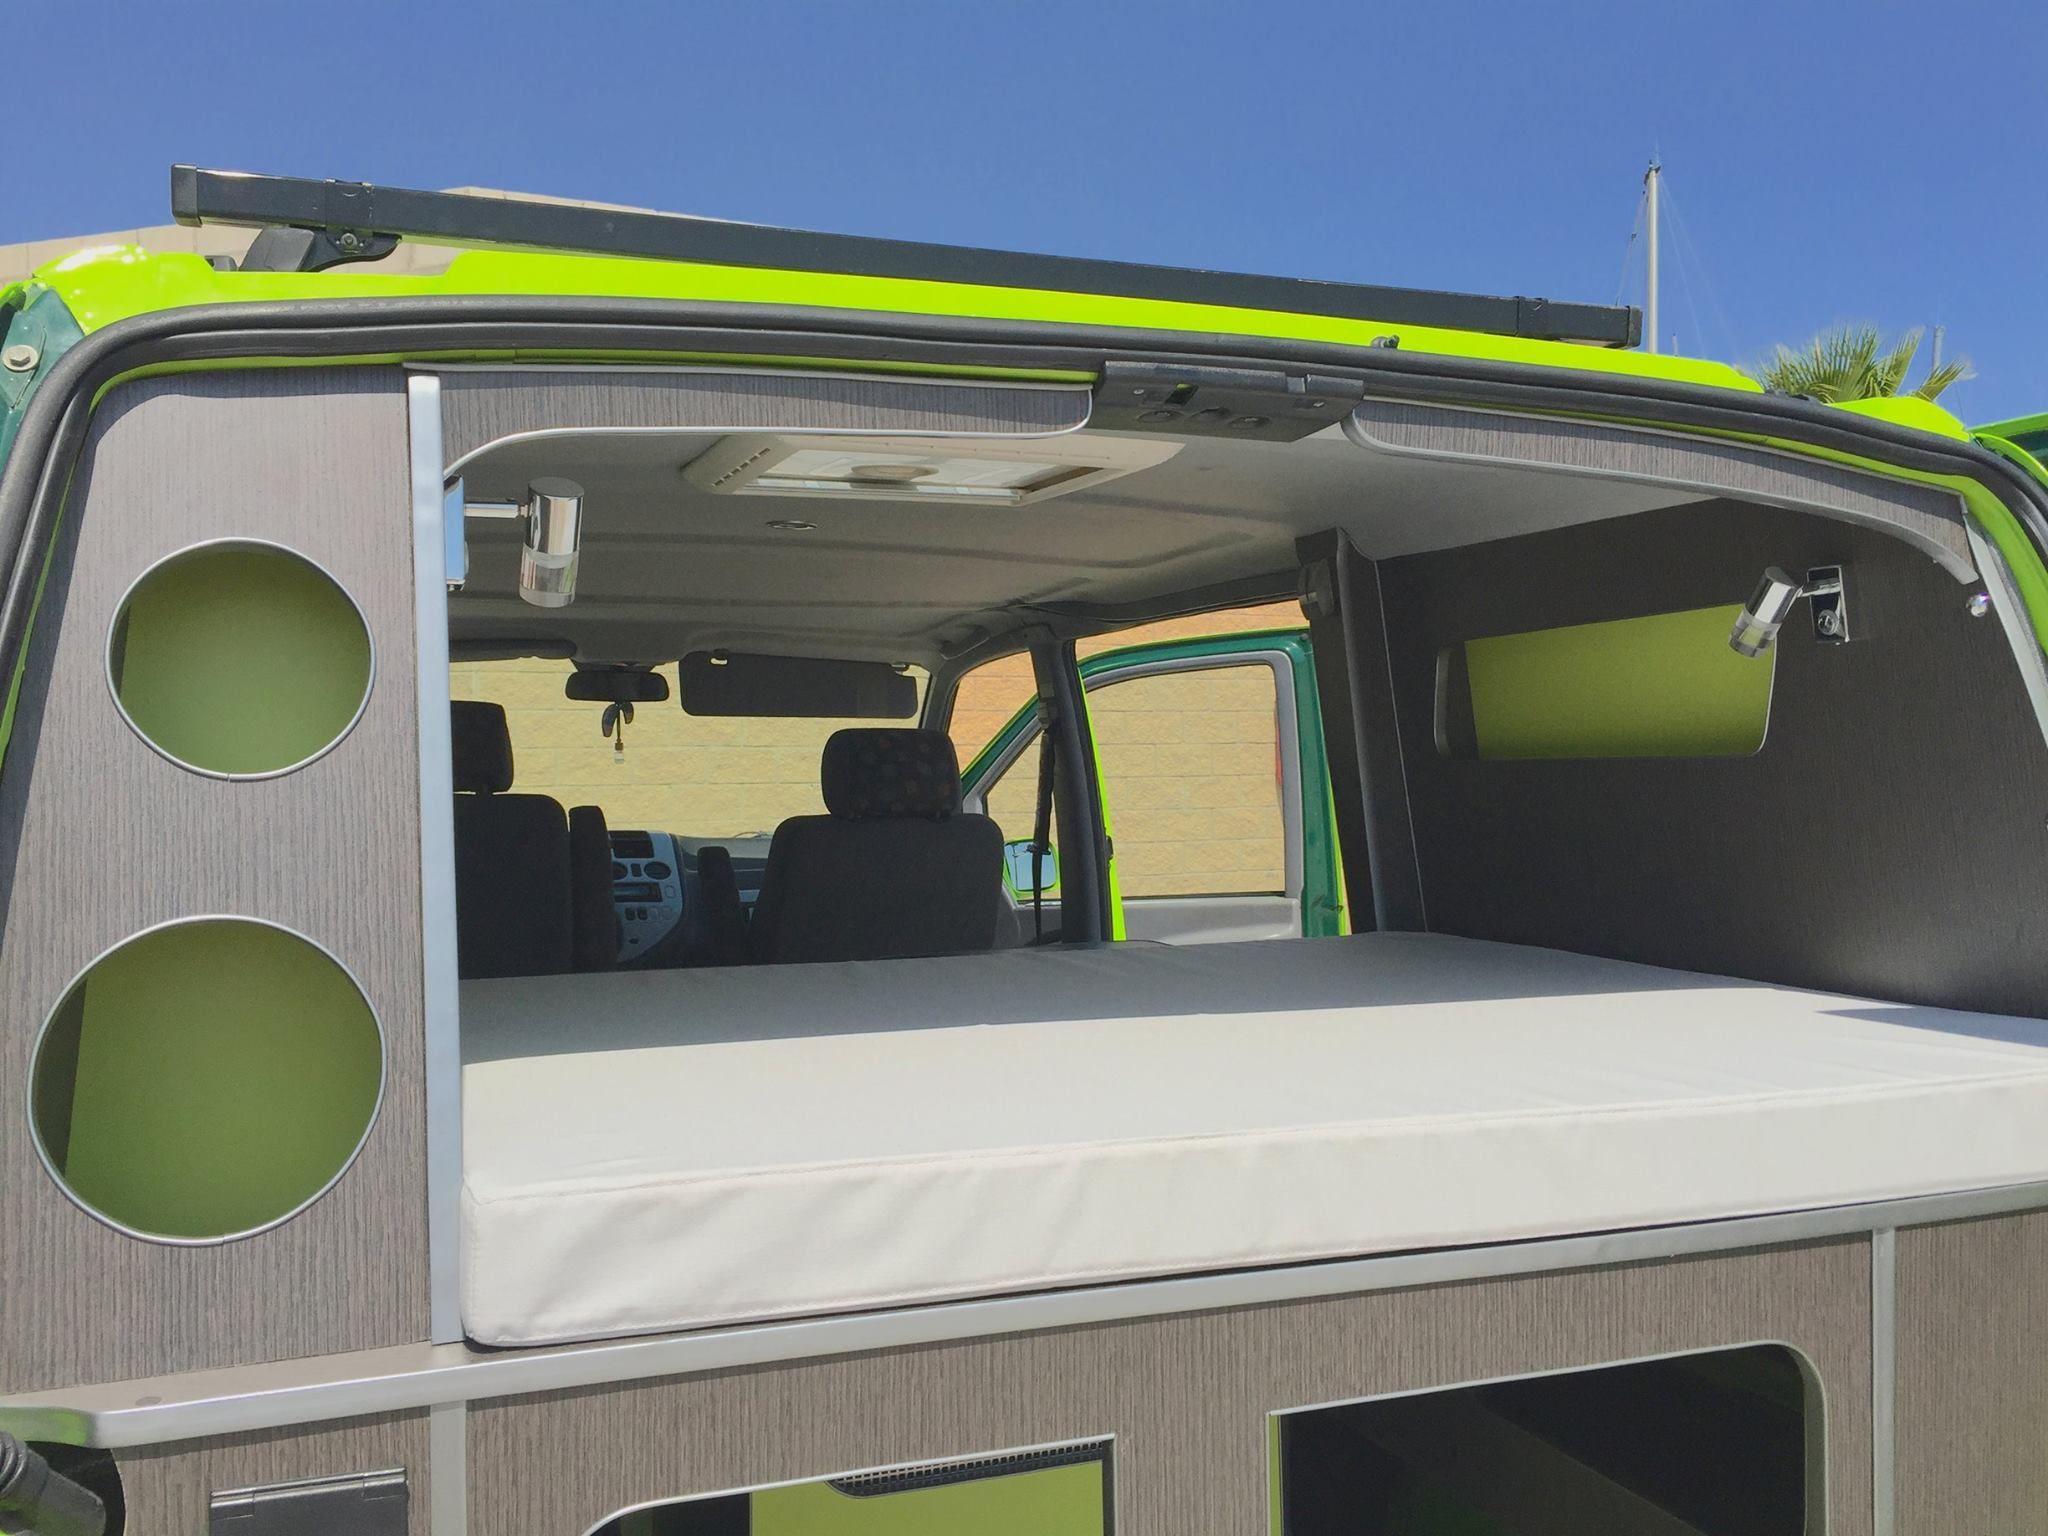 Taller de reparación de furgoneta camper en Tarragona